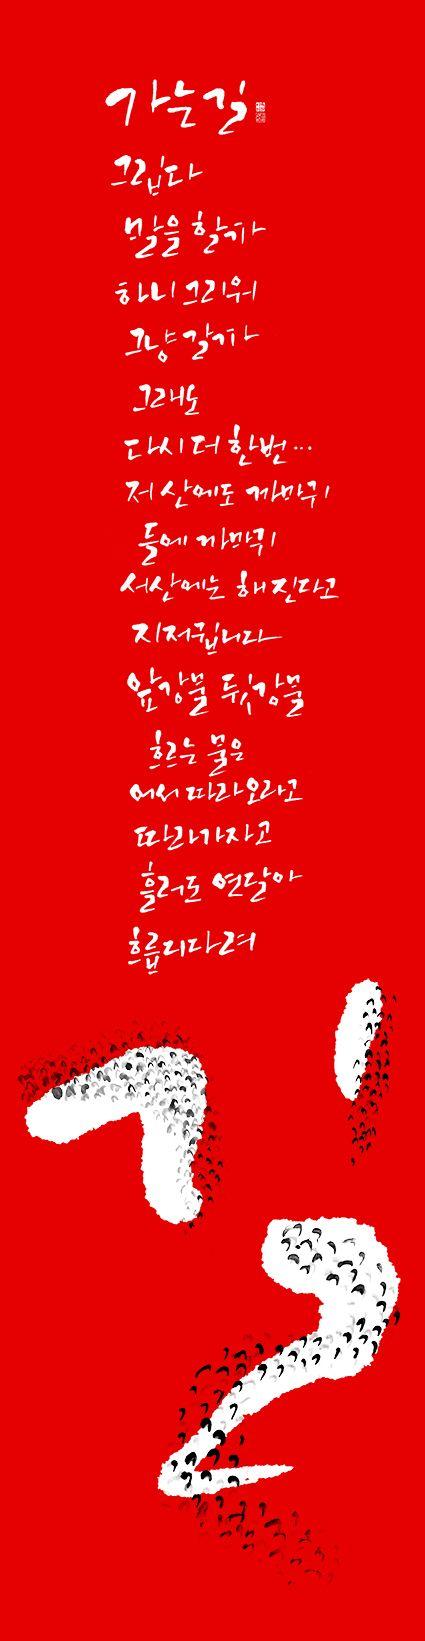 calligraphy_가는 길_김소월